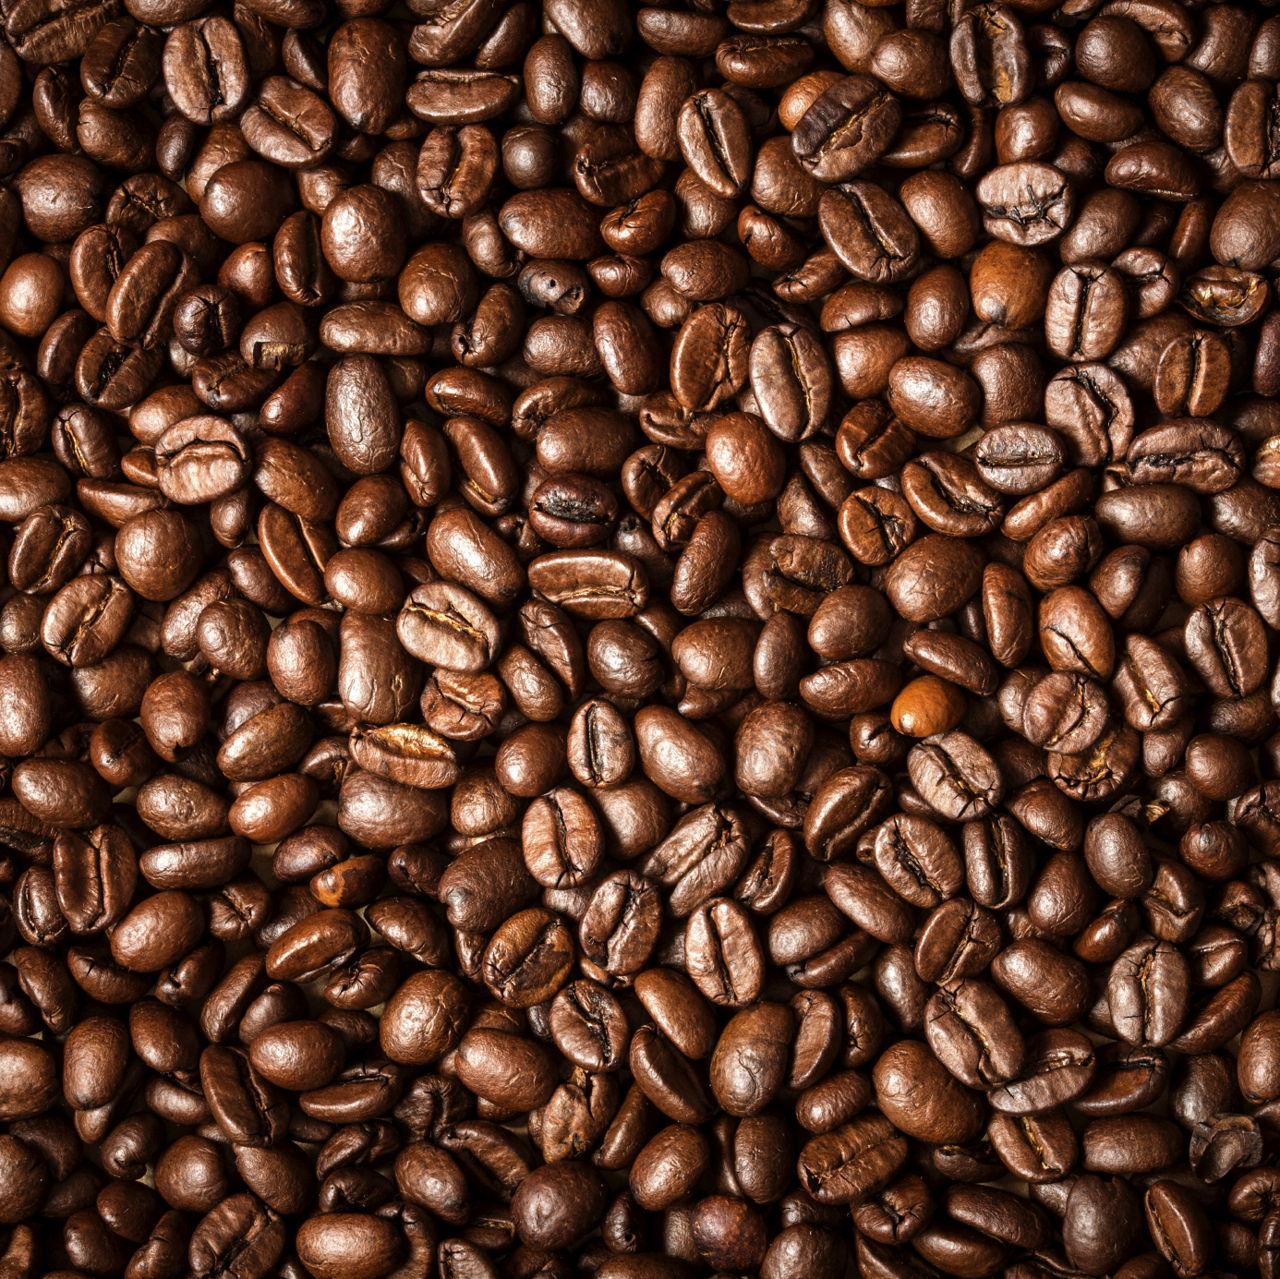 Caffeine Withdrawal Remedies